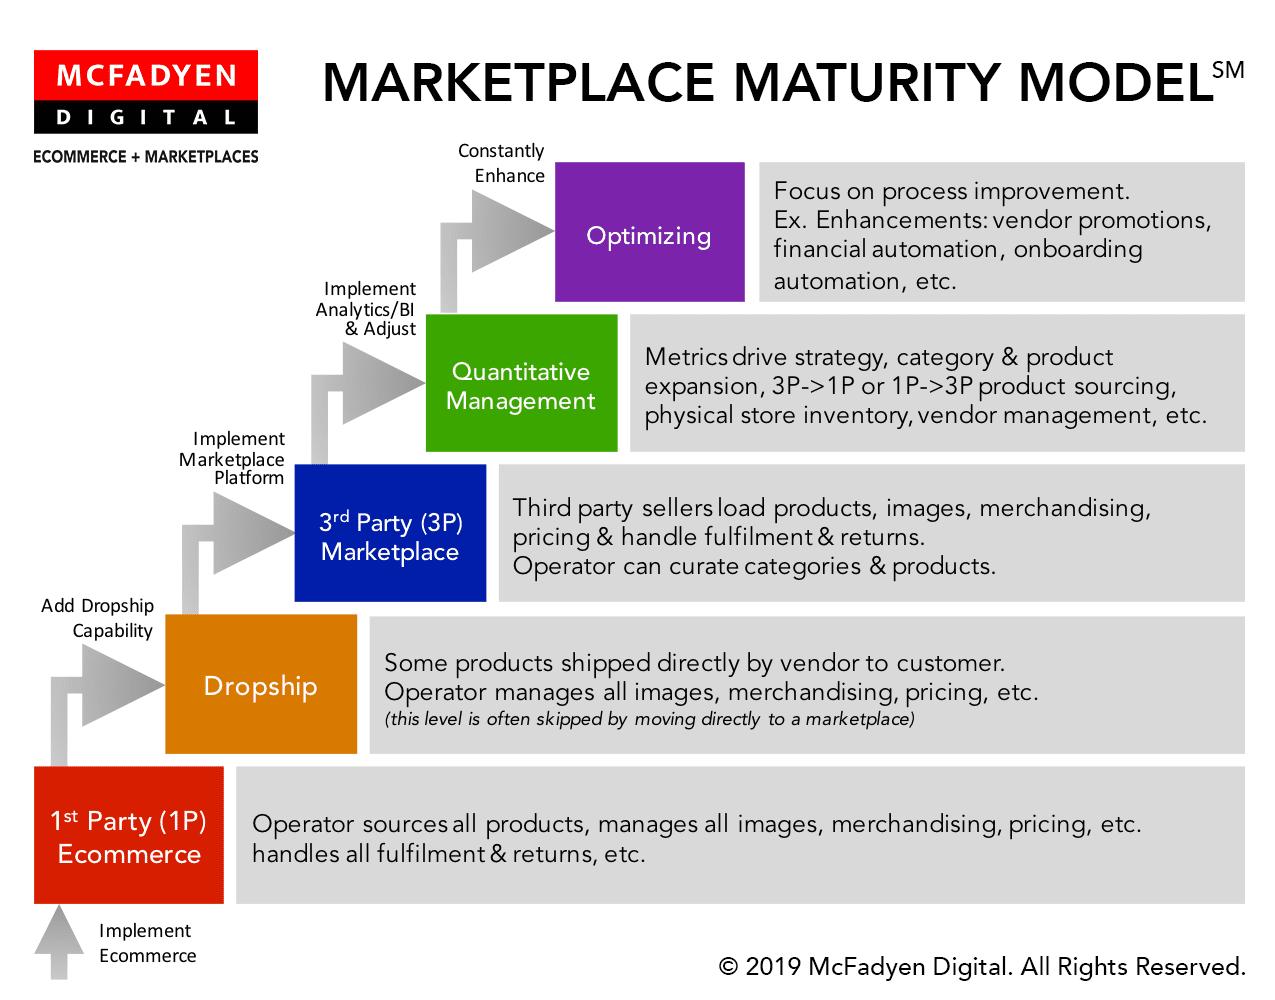 Marketplace Maturity Model - Condensed